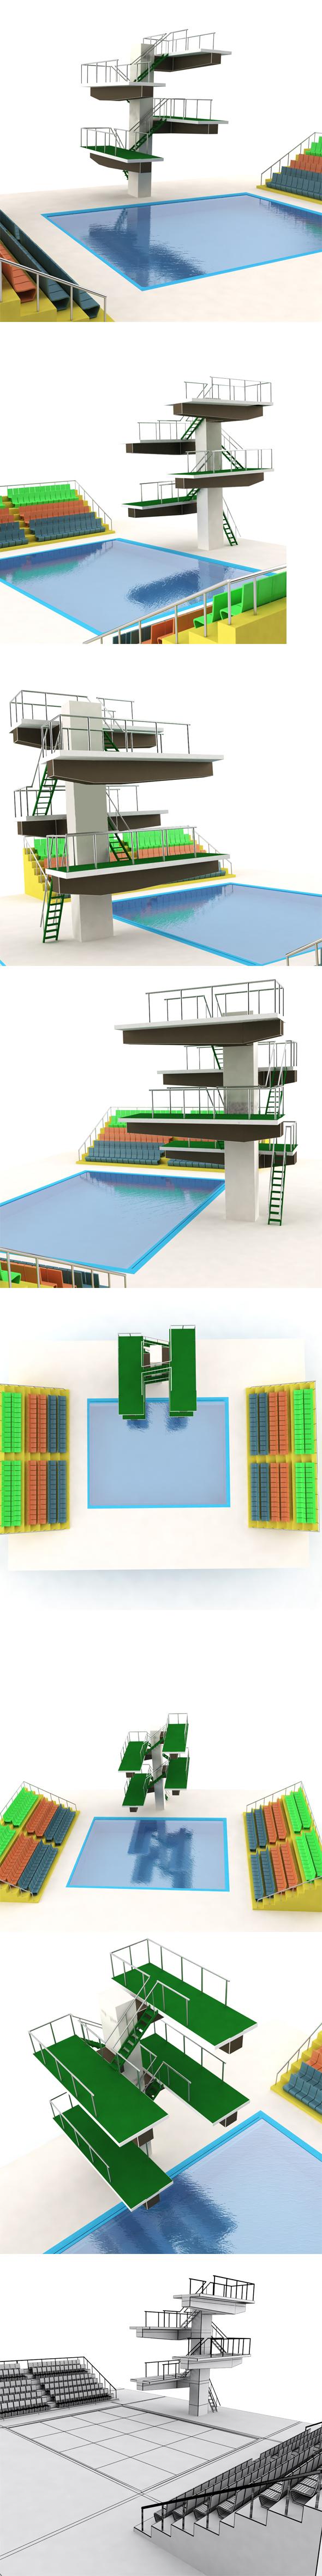 Diving Pool - 3DOcean Item for Sale